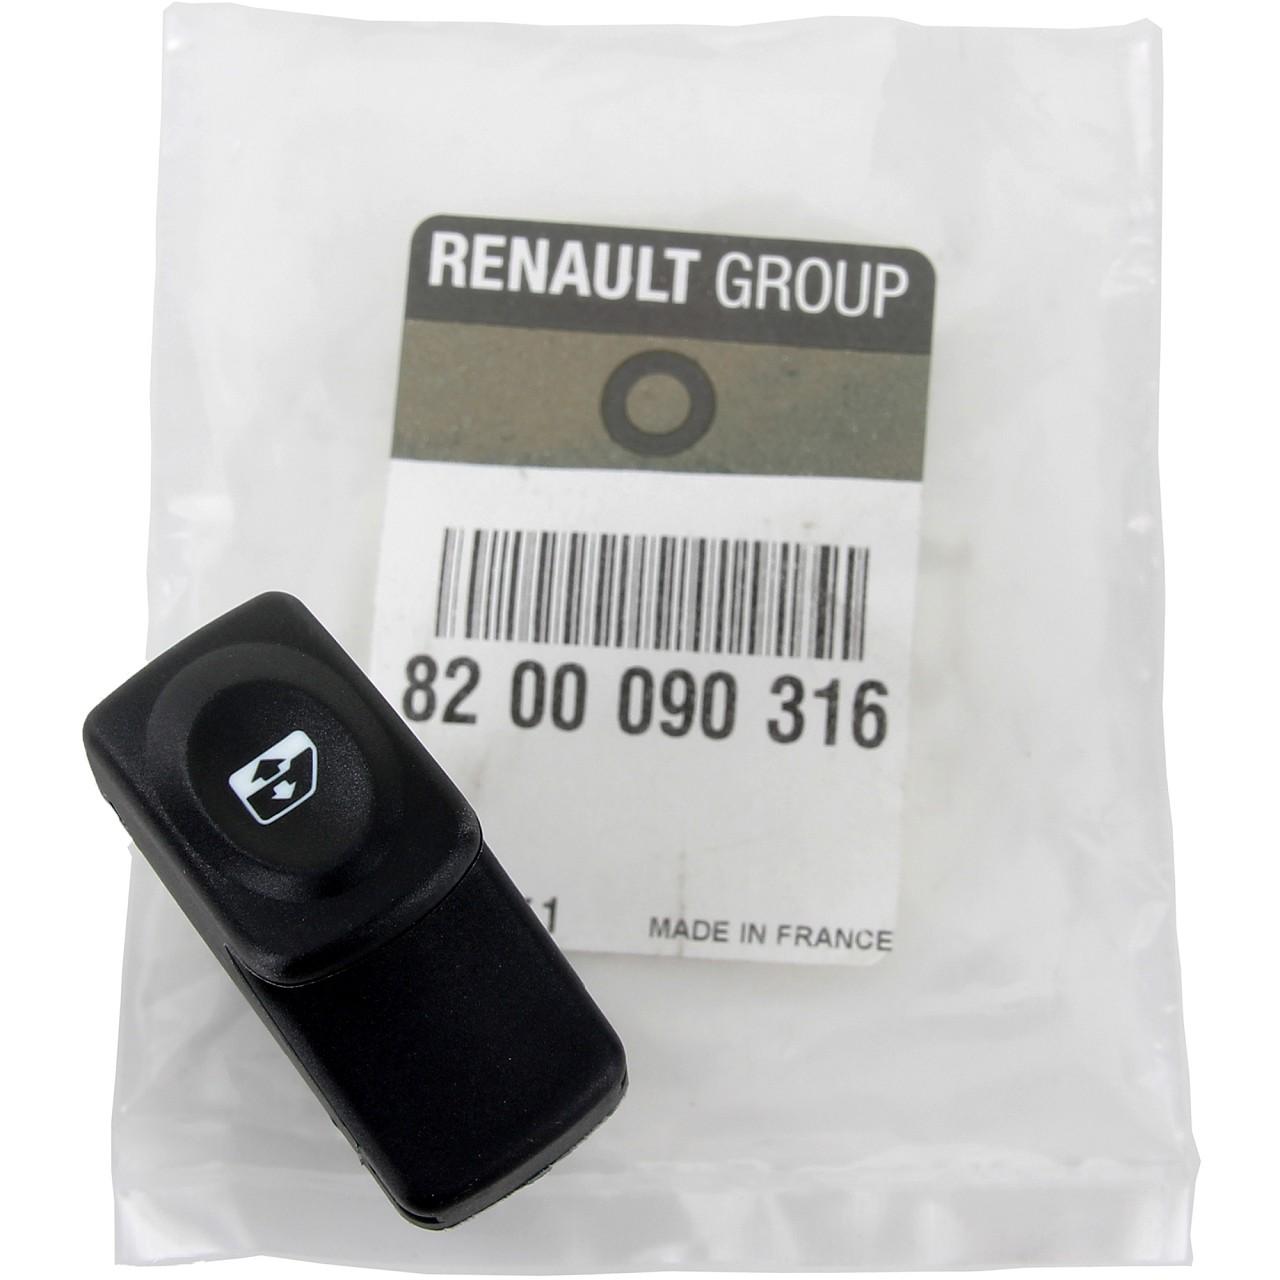 ORIGINAL Renault Schalter Fensterheber 5-polig Kangoo vorne 8200090316